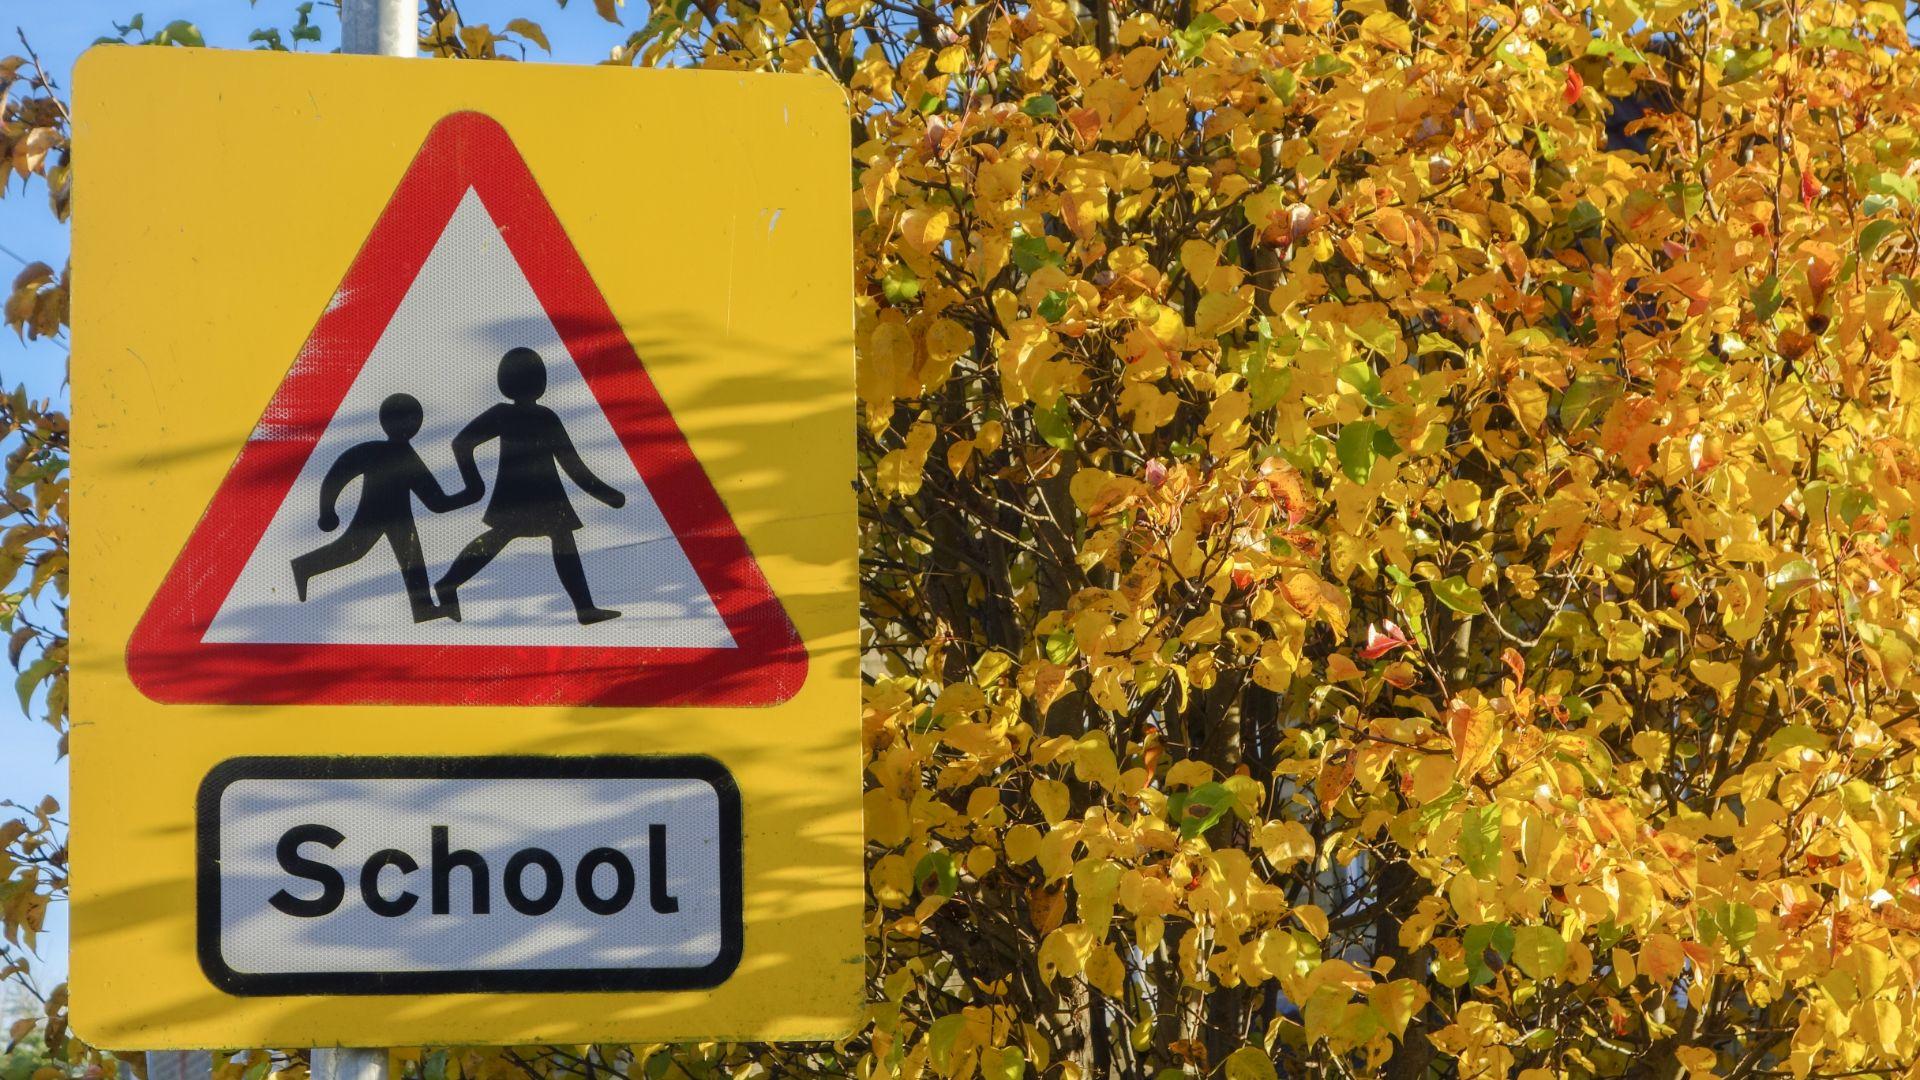 Stay safe on the school run